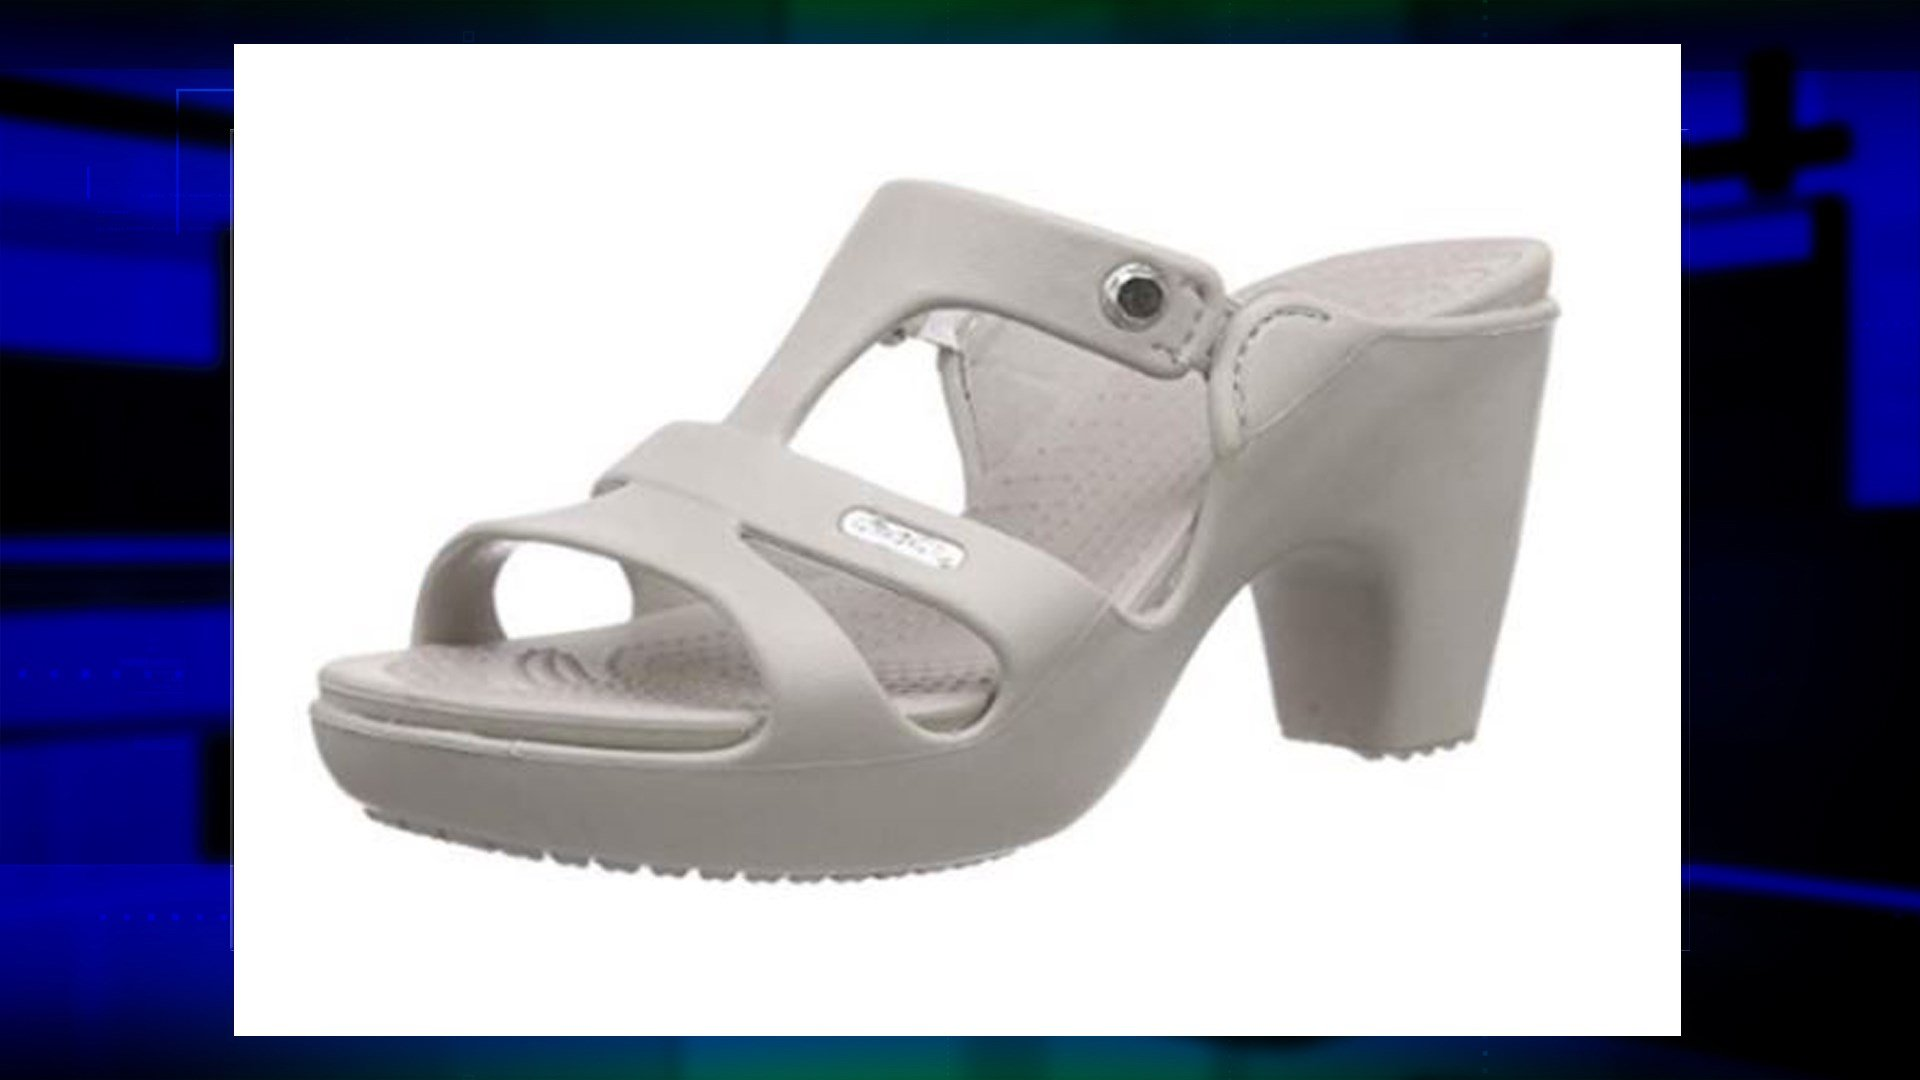 The 'Cyprus V Heel' from Crocs photo: CROCS